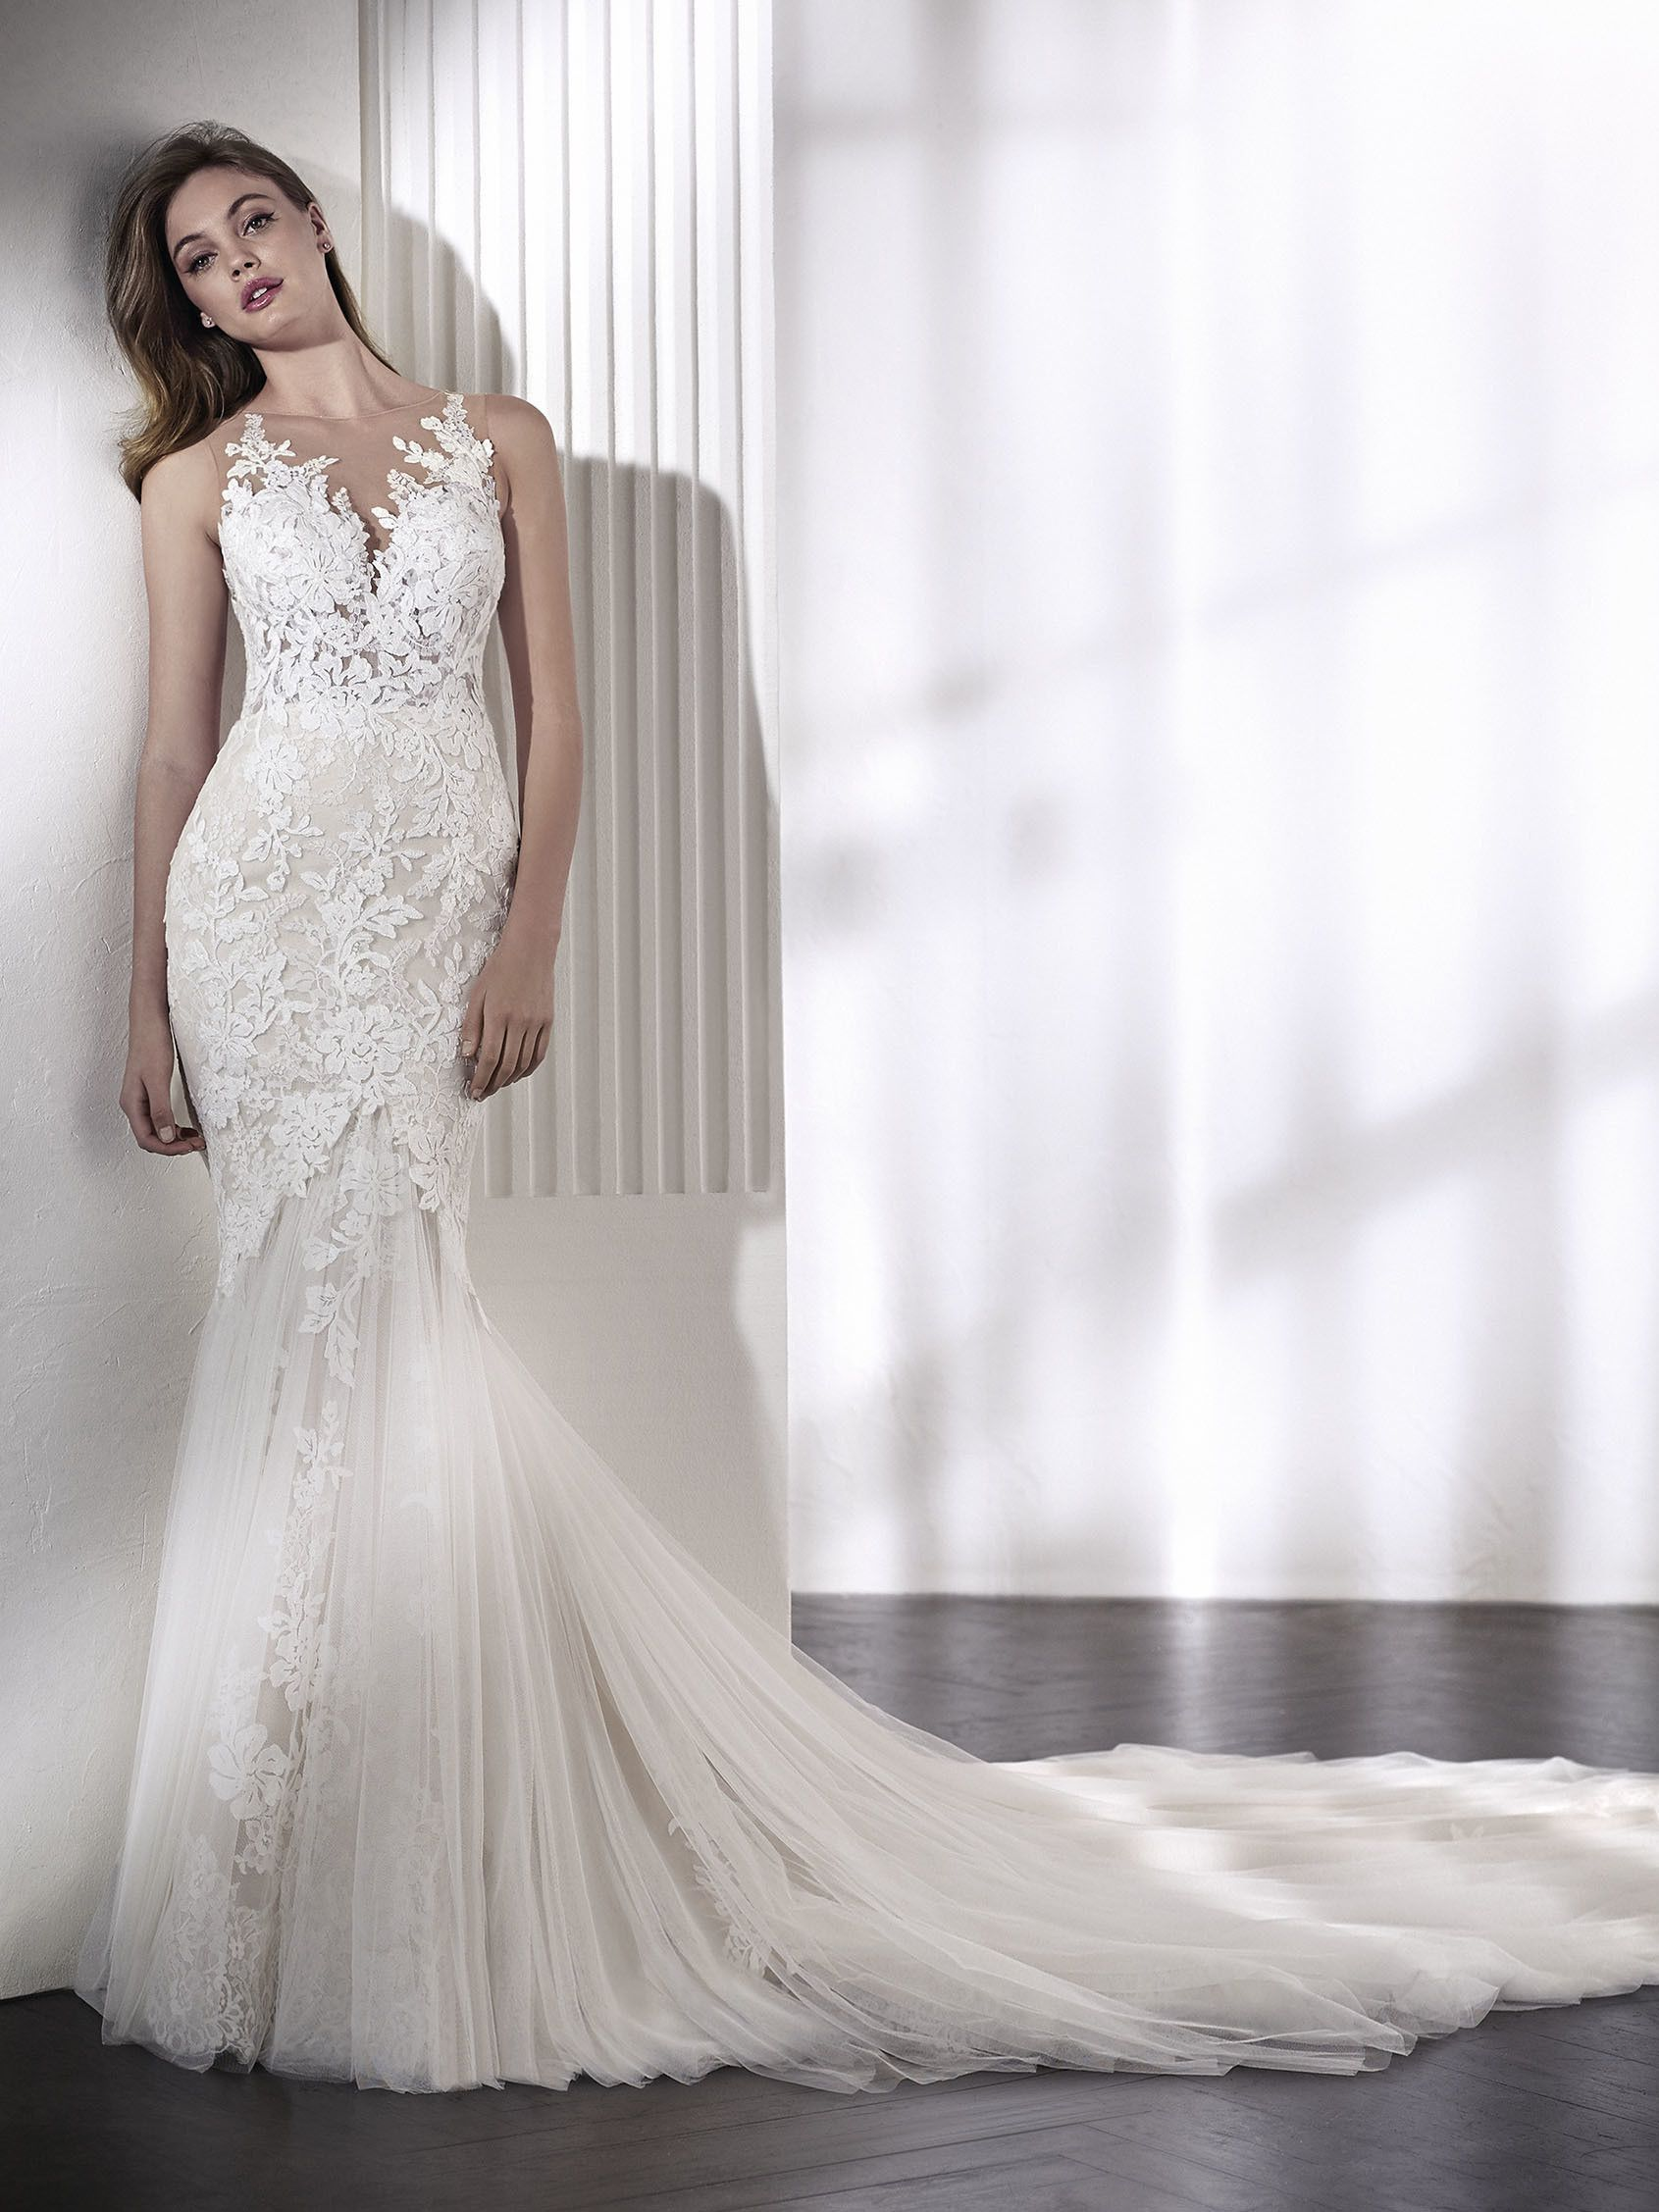 LENI mermaid wedding dress | robe de mariee | Pinterest | Mermaid ...